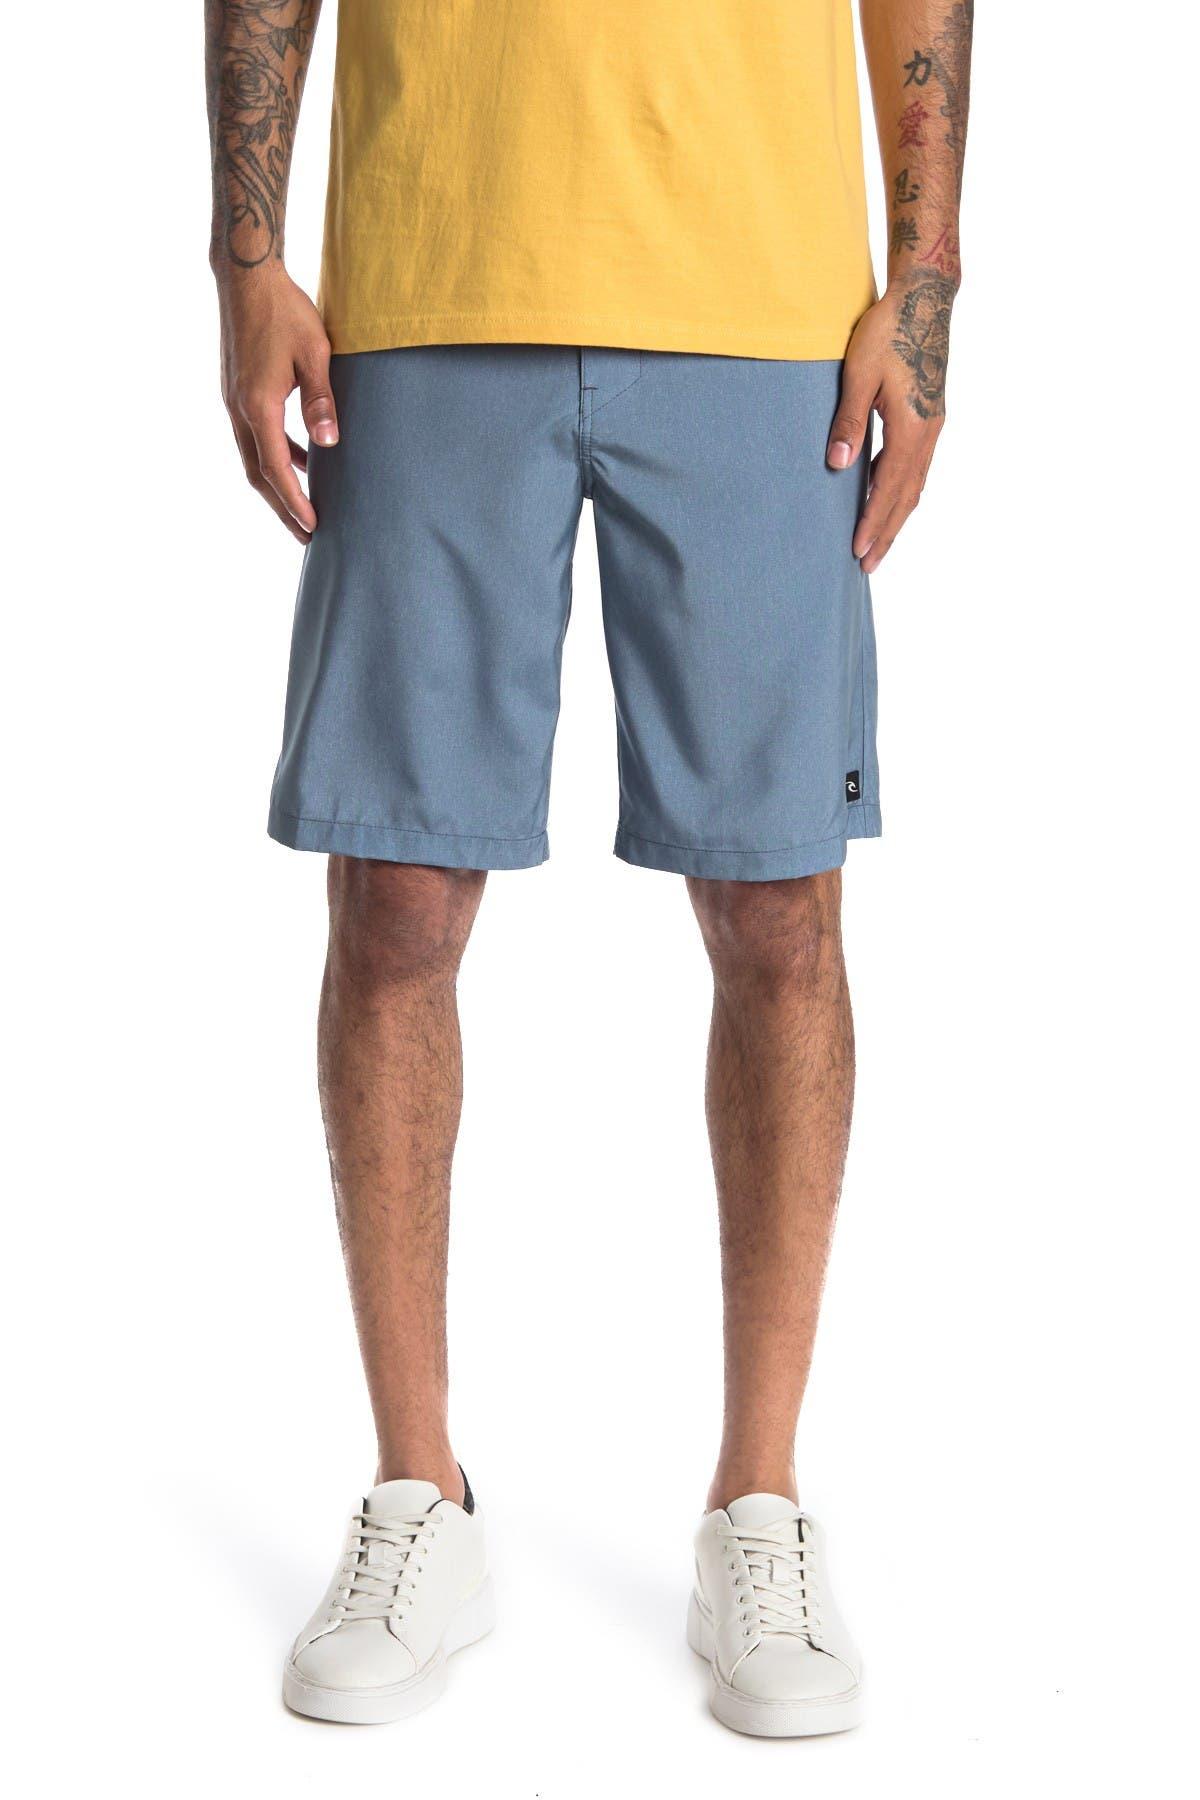 Image of Rip Curl Phase Boardwalk Swim Shorts